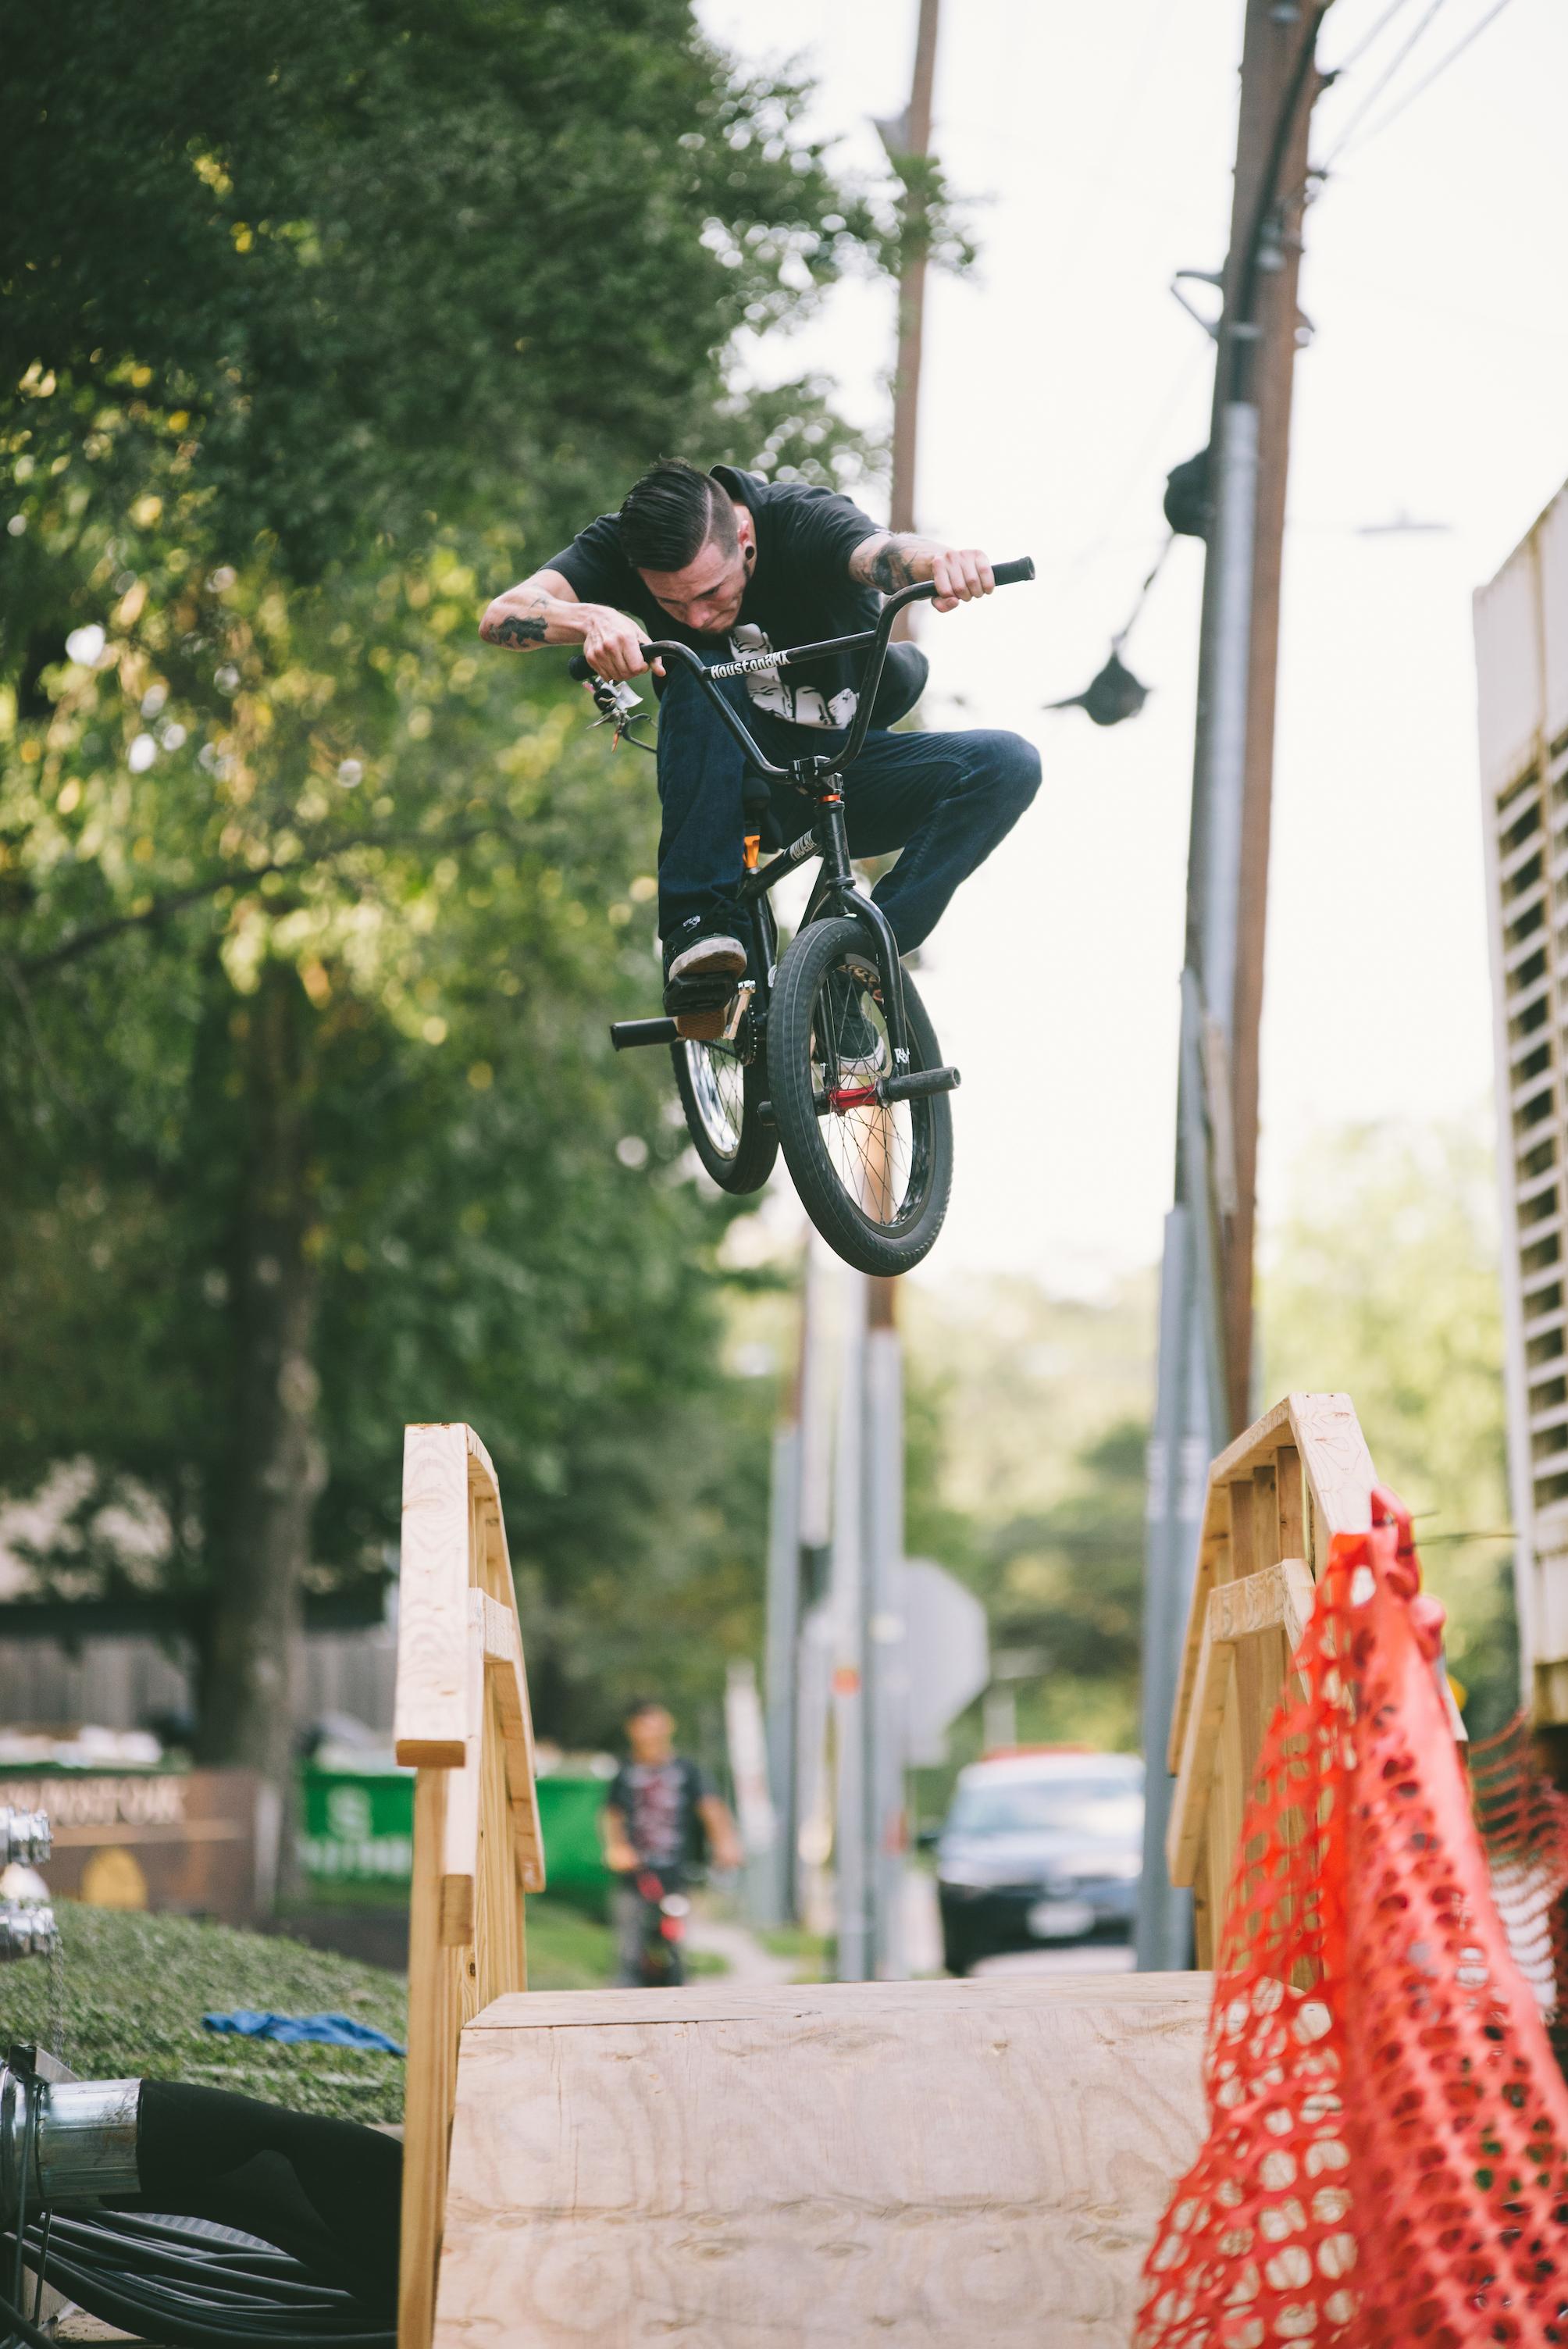 20171001 sunday street ride Kirby Crumpler_half res_13.jpg